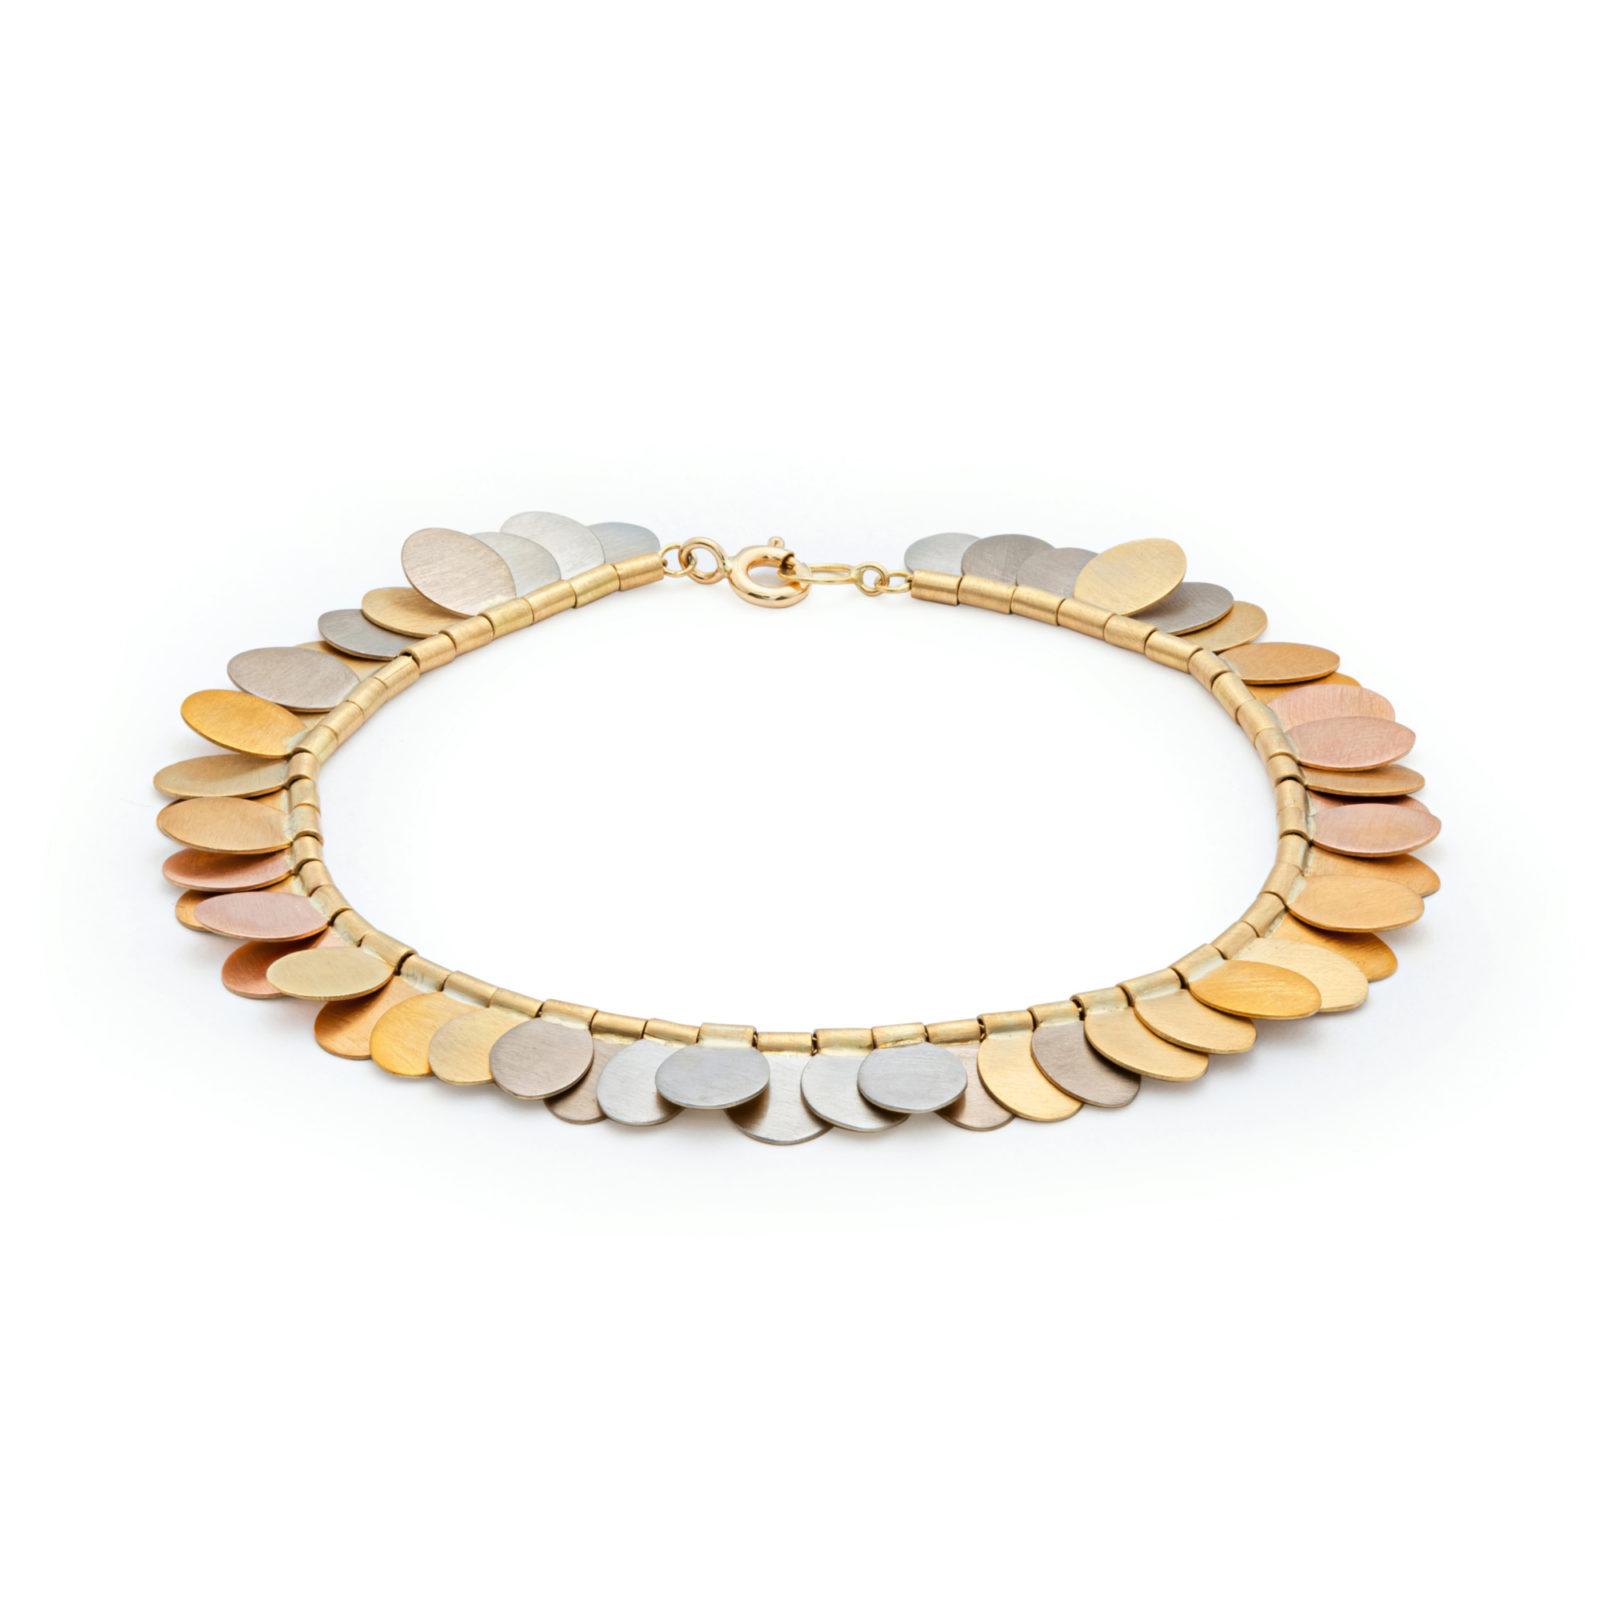 Sia Taylor FB1 YRAIN Rainbow Gold Bracelet Back WB